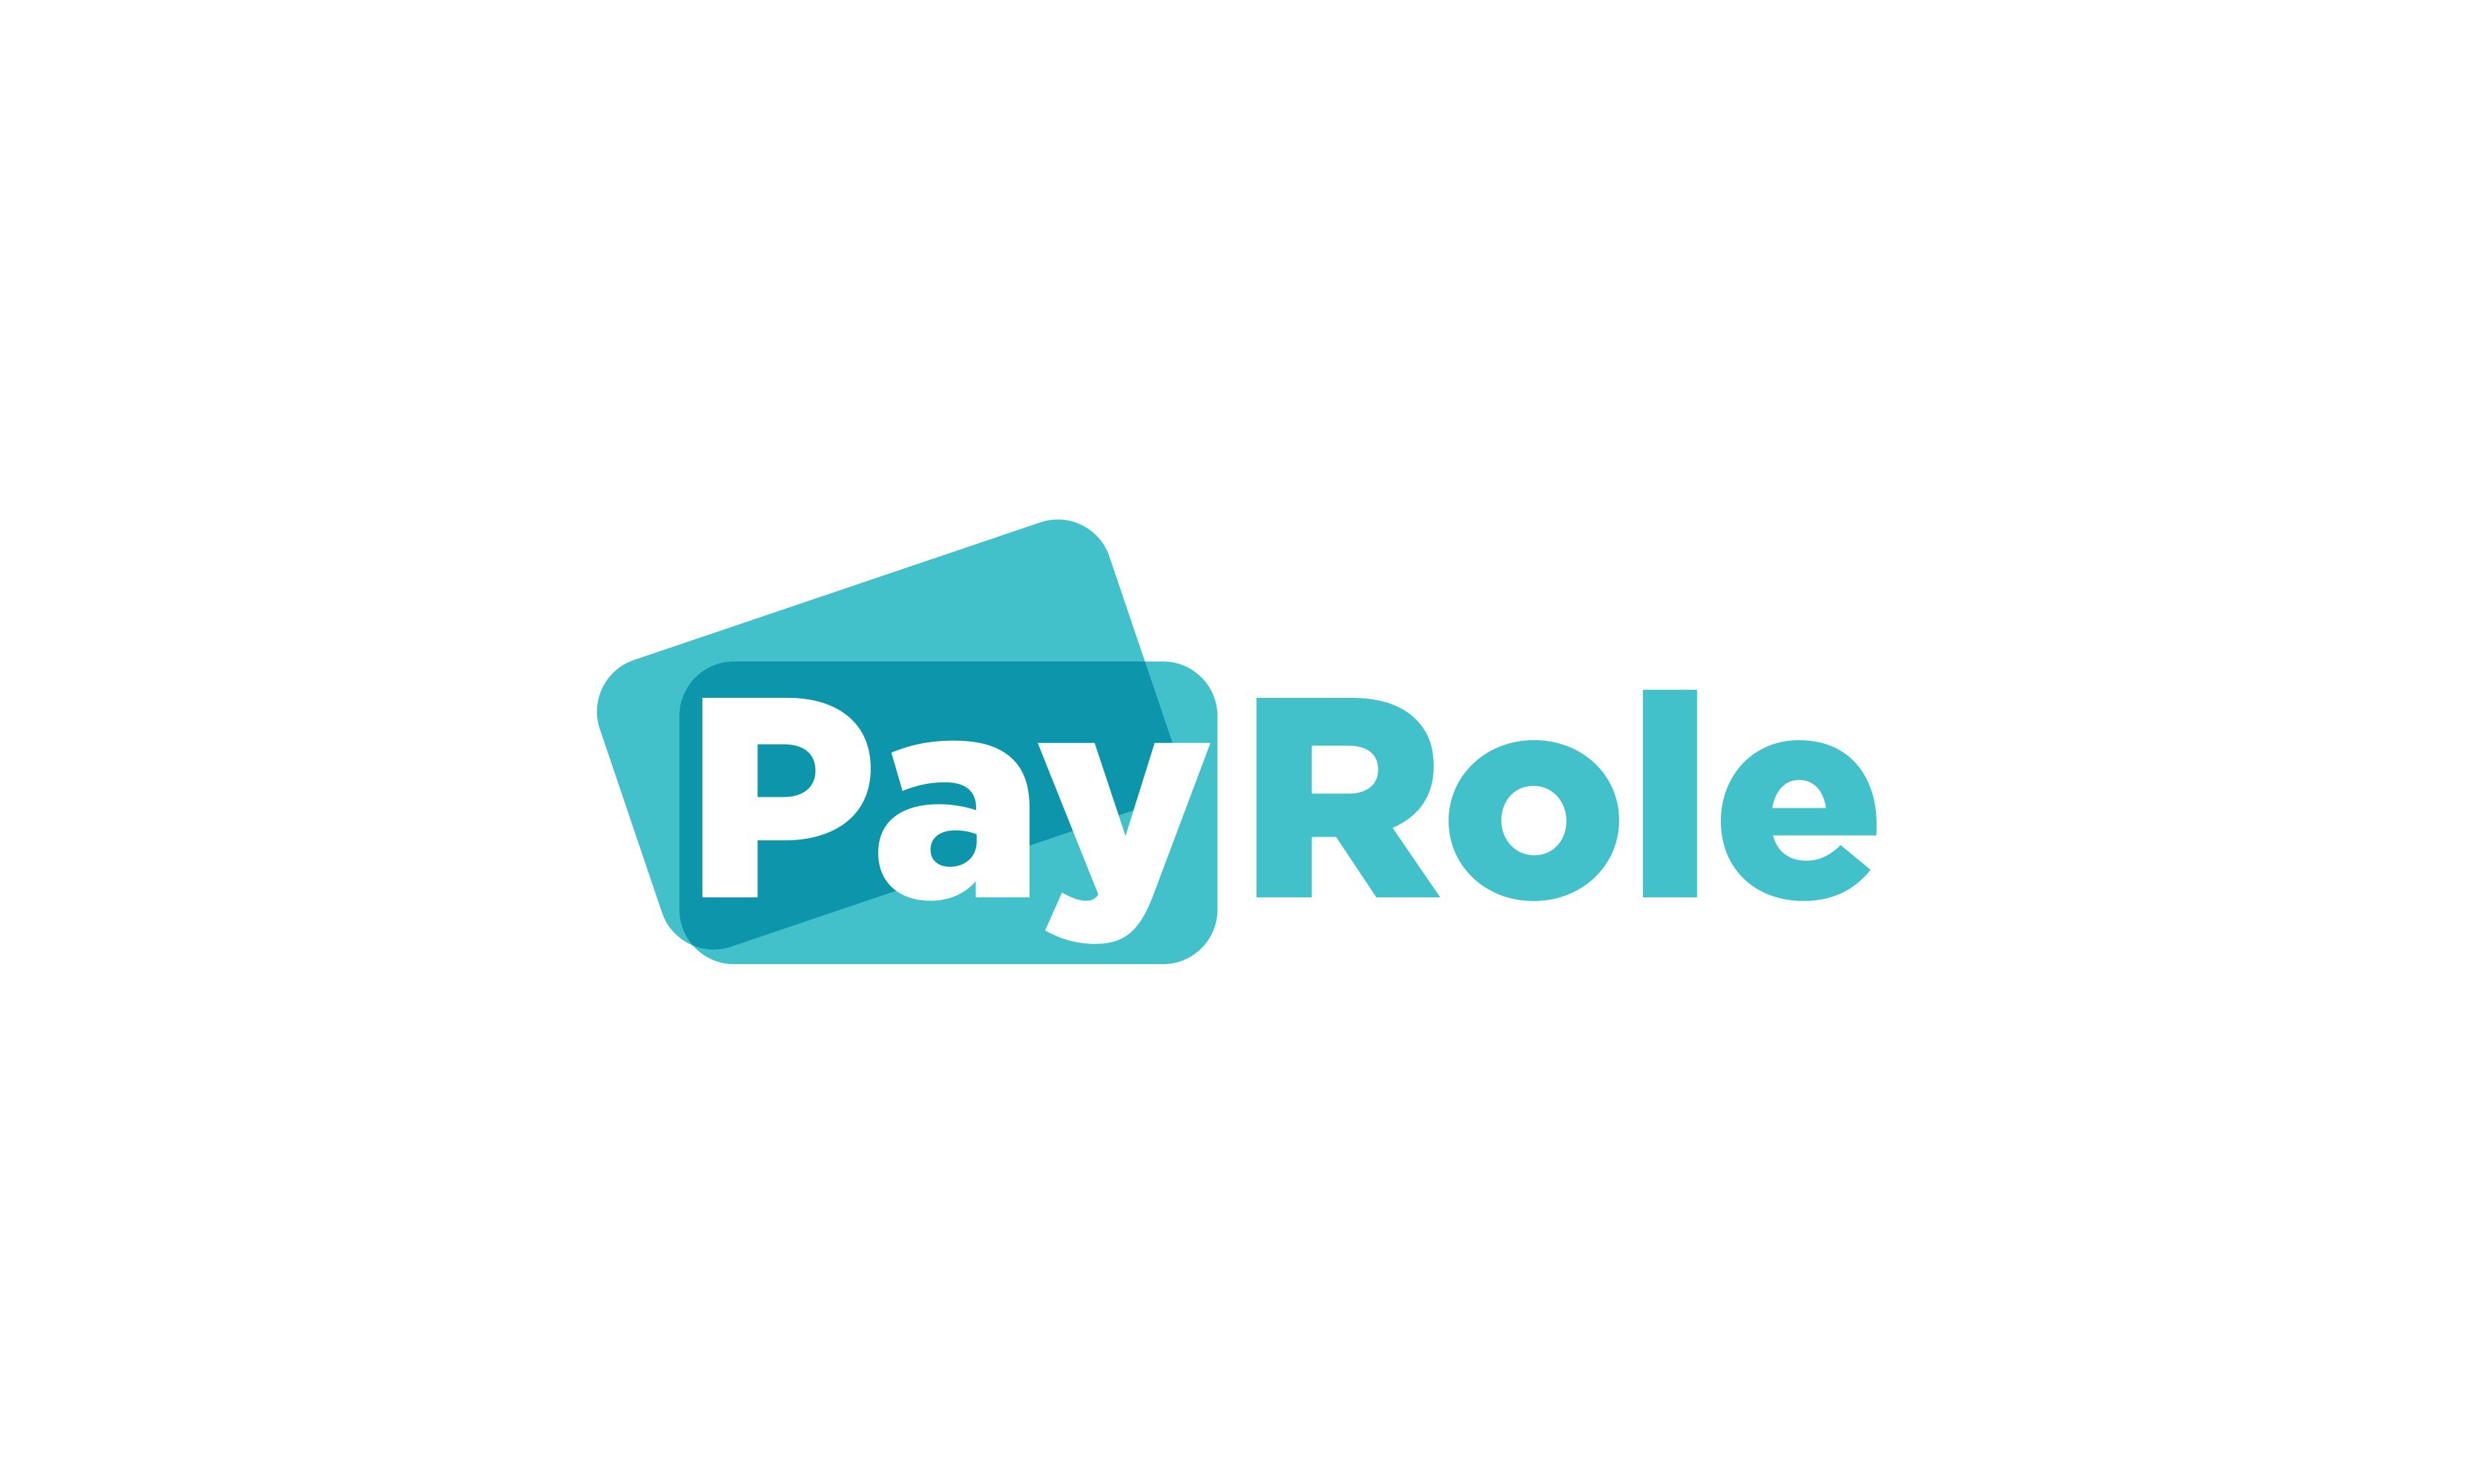 Payrole